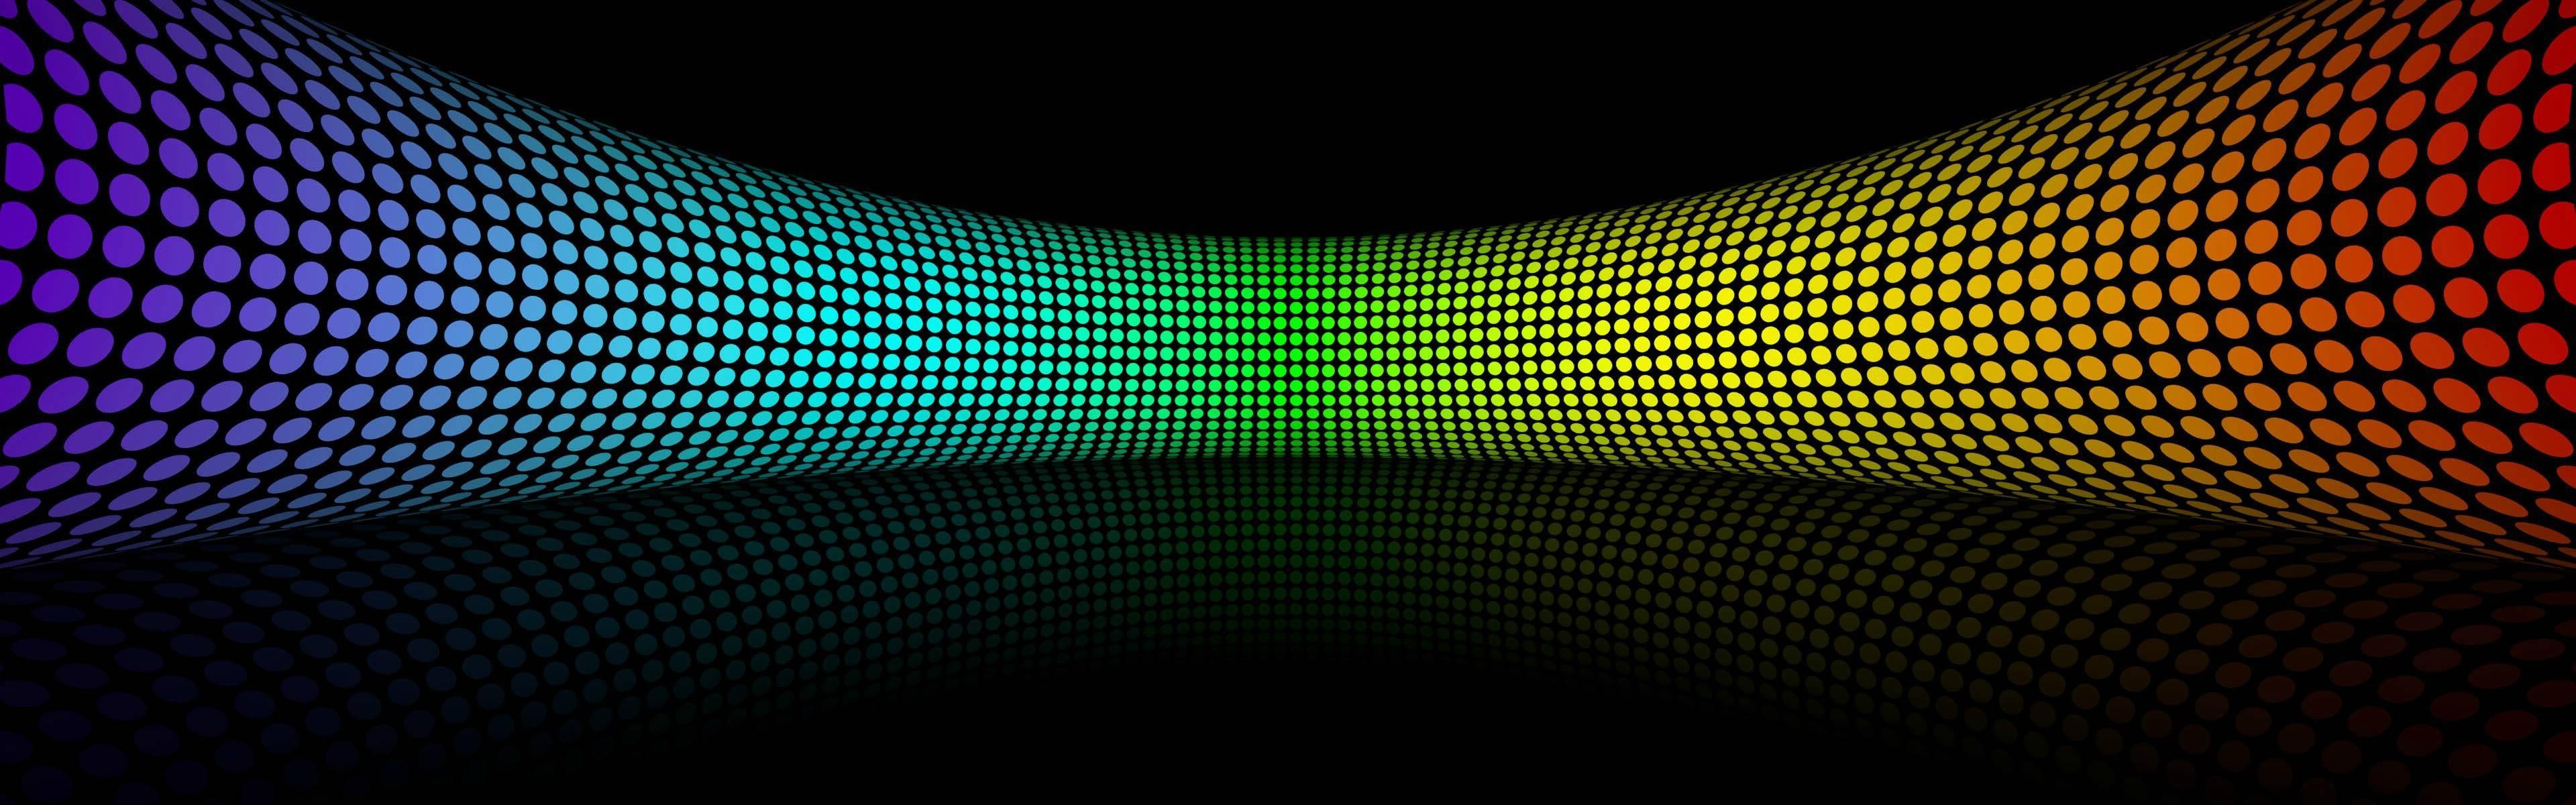 Rings rainbows wallpaper | 3840x1200 | 9195 | WallpaperUP